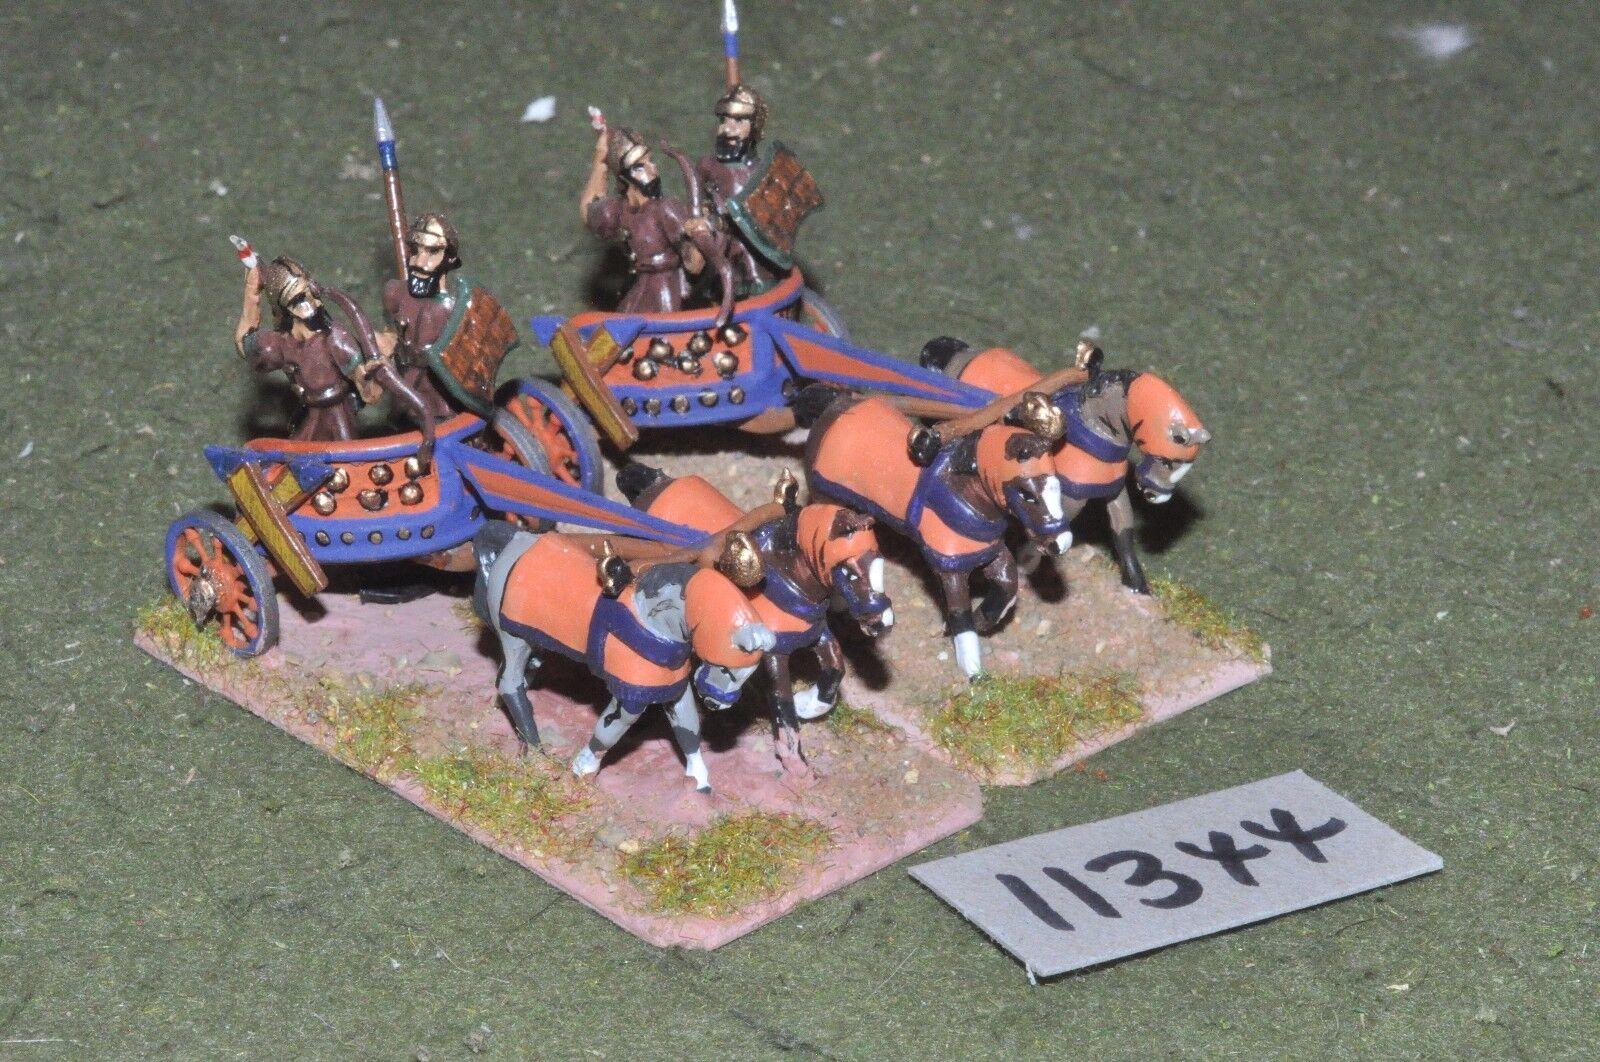 25mm biblical   hittite - chariots 2 chariots - chariot (11344)